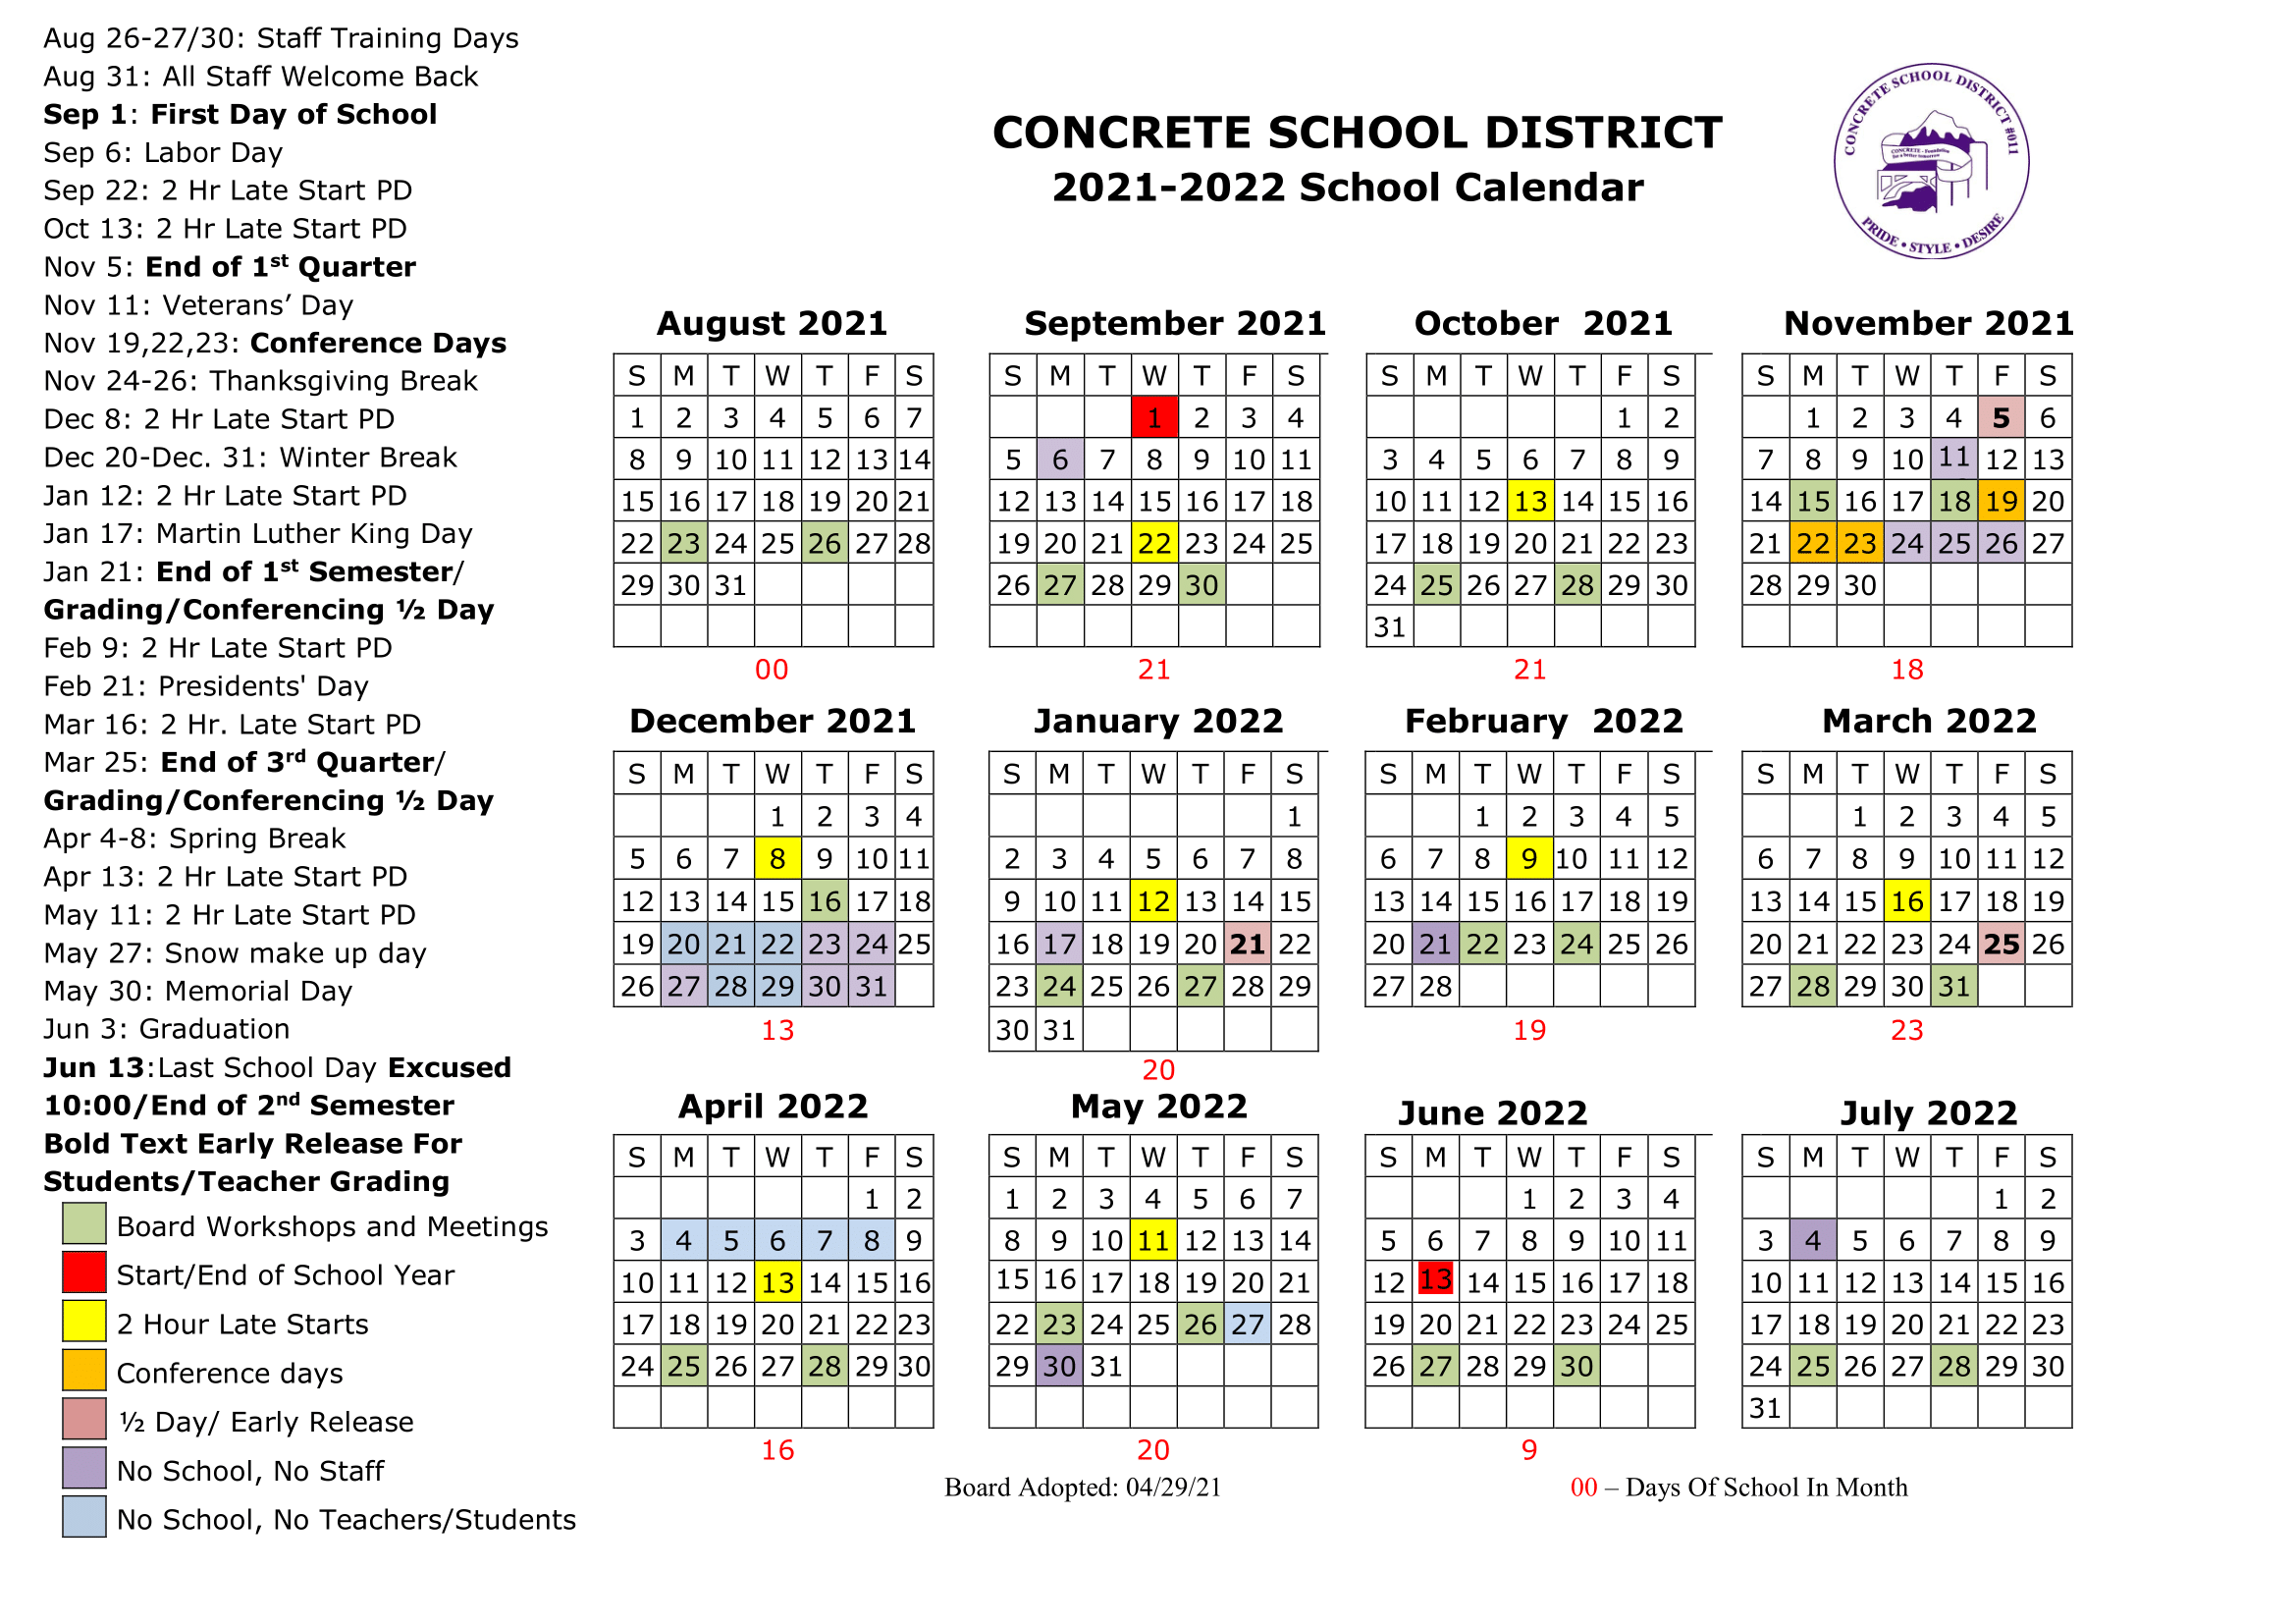 2021-2022 Concrete School District School Calendar